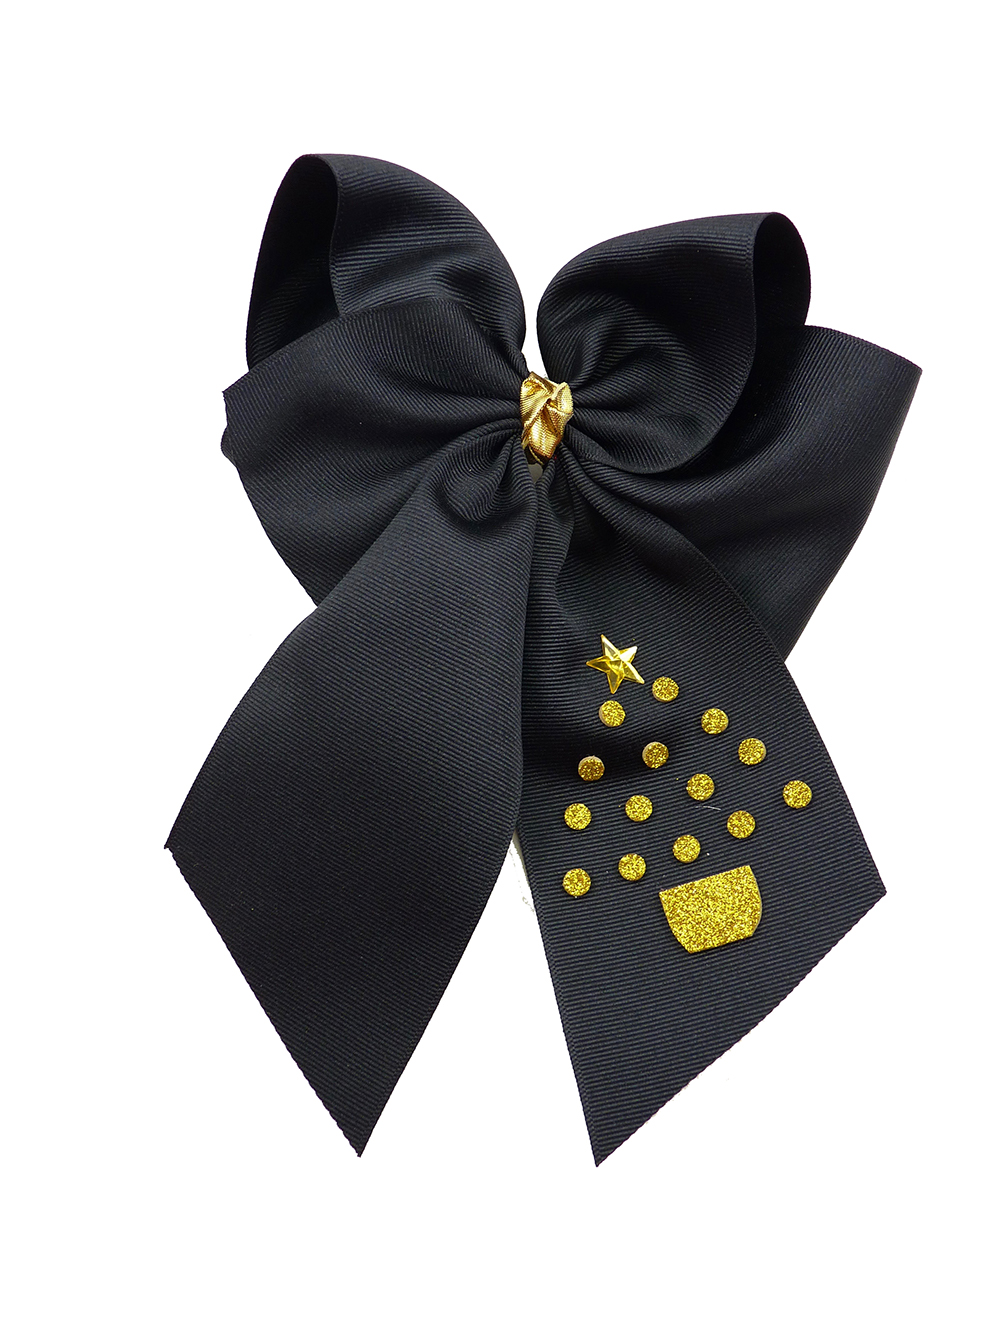 black hair bow hairbow gold glitter festive tree Christmas Xmas winter holiday